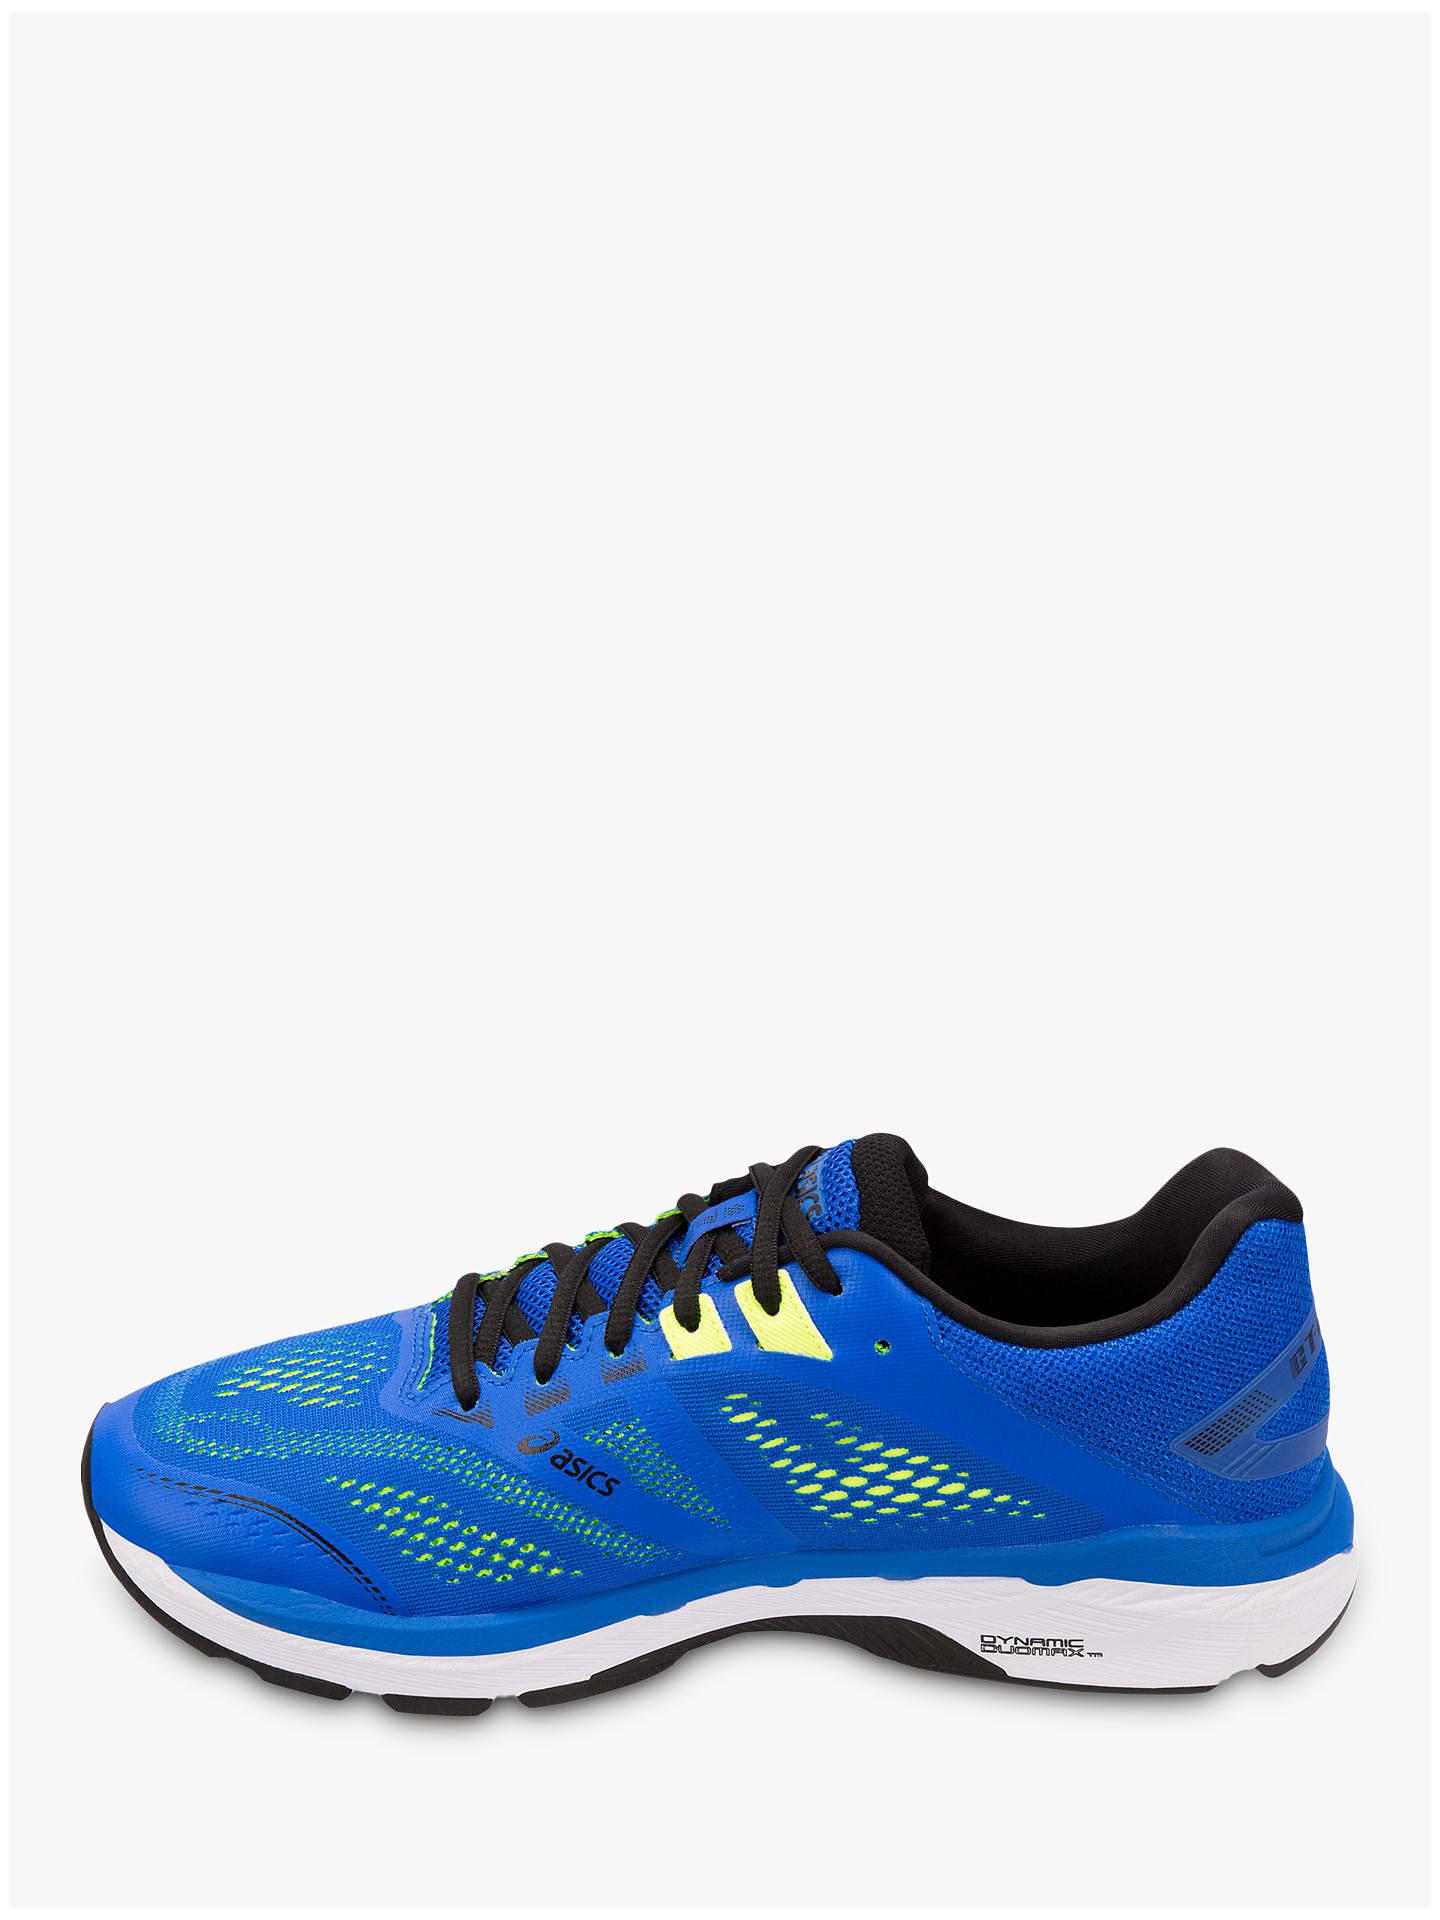 ASICS GT-2000 7 Men's Running Shoes at John Lewis & Partners